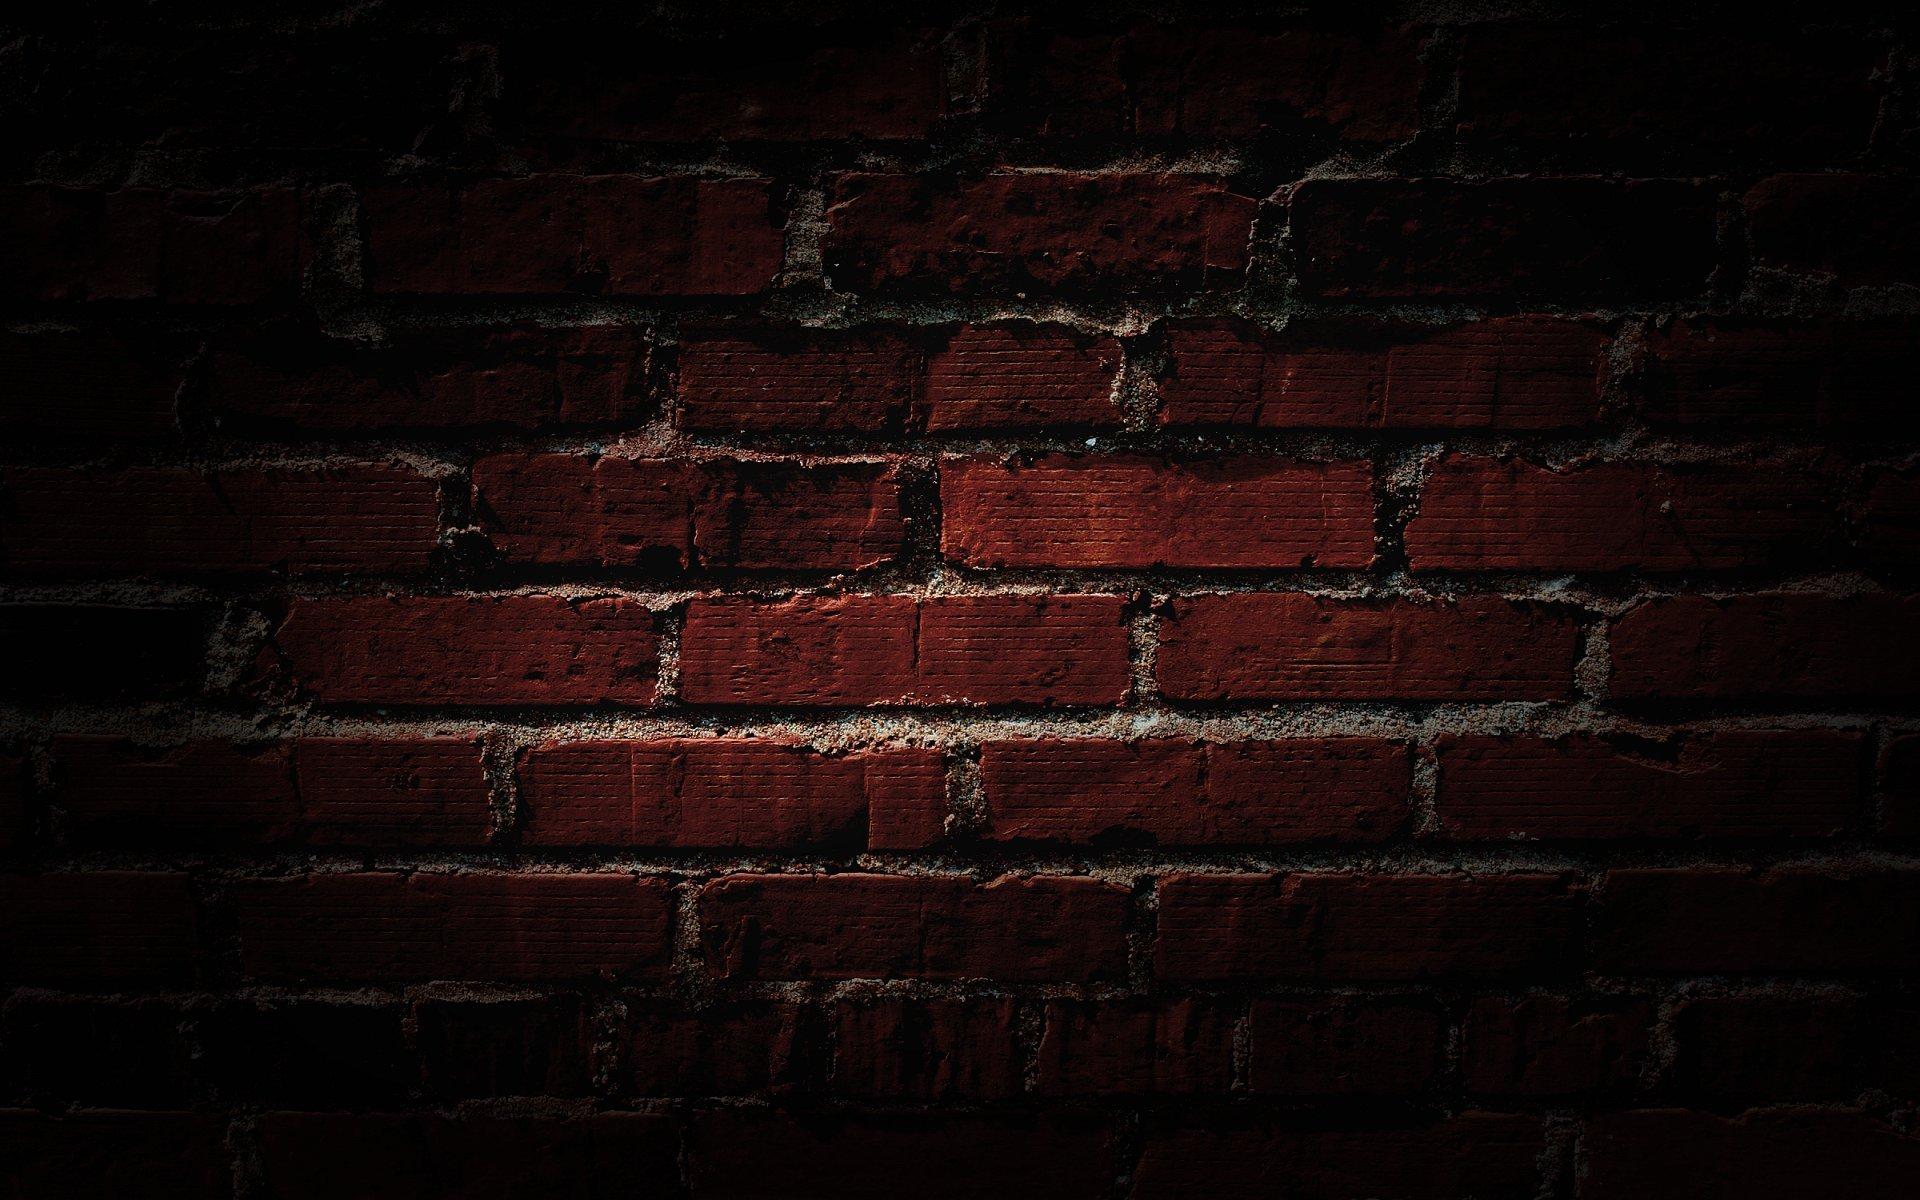 Brick Wall Wallpapers  Hd Desktop Wallpapers  4k Hd